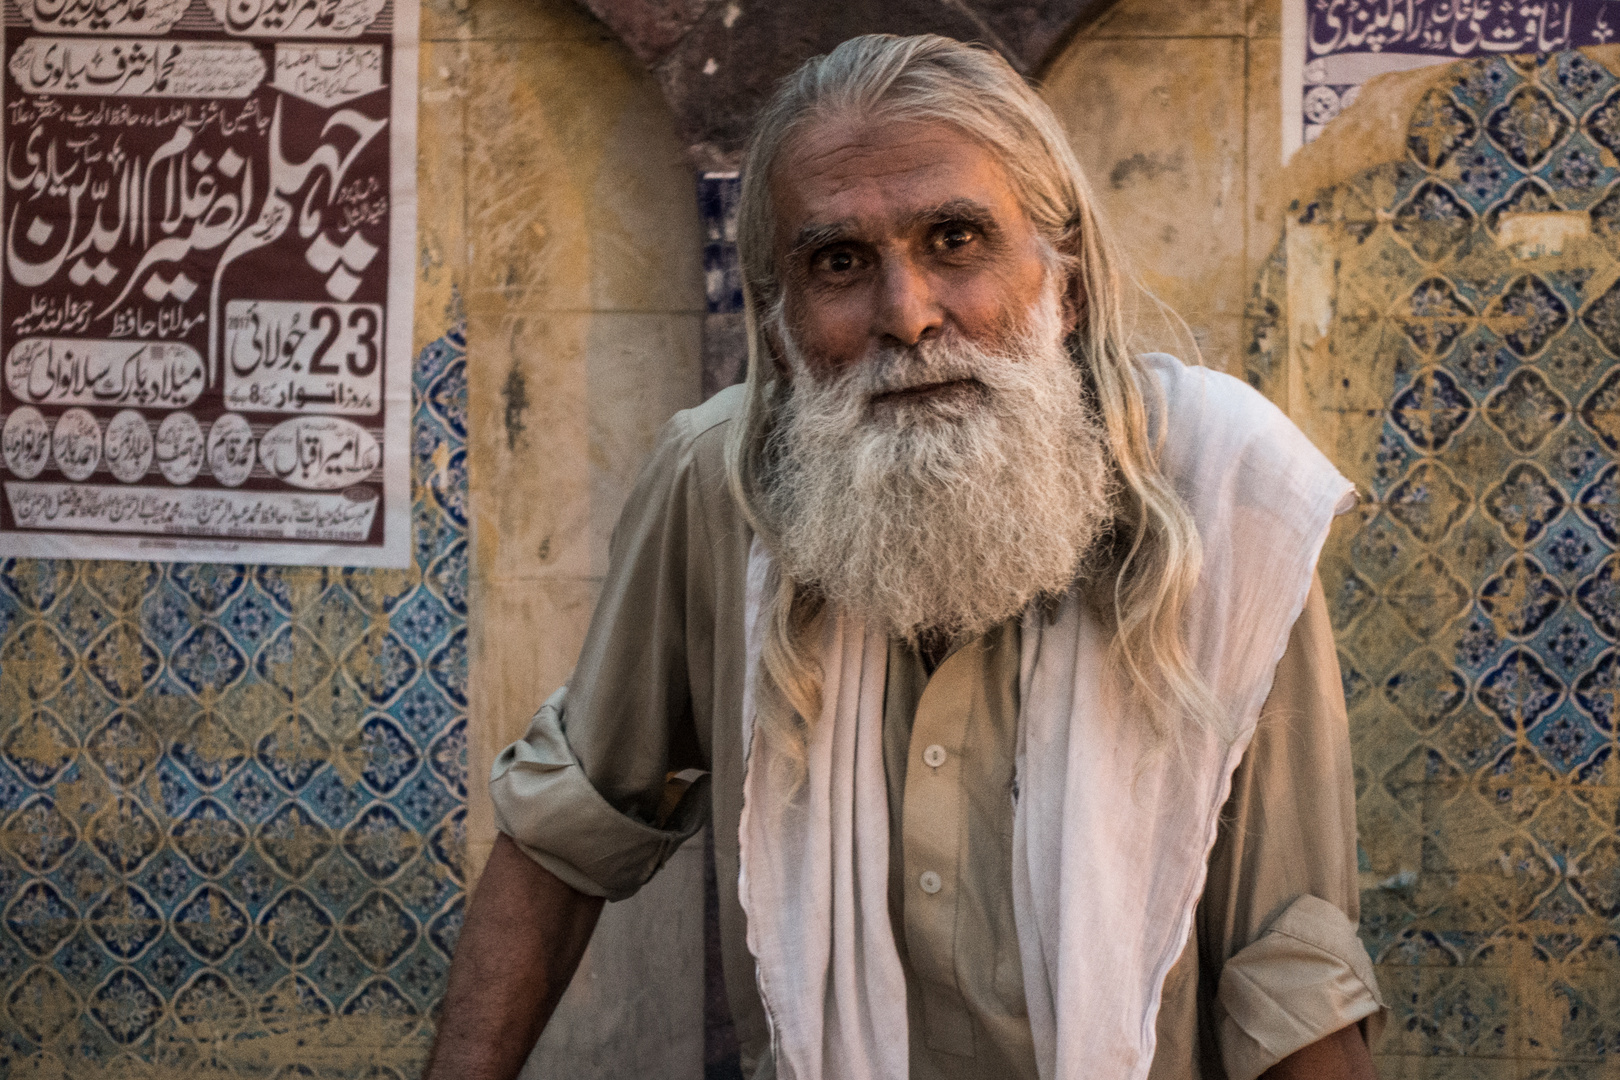 Porträts aus Pakistan: Begegnung am Rande des Basars in Rawalpindi